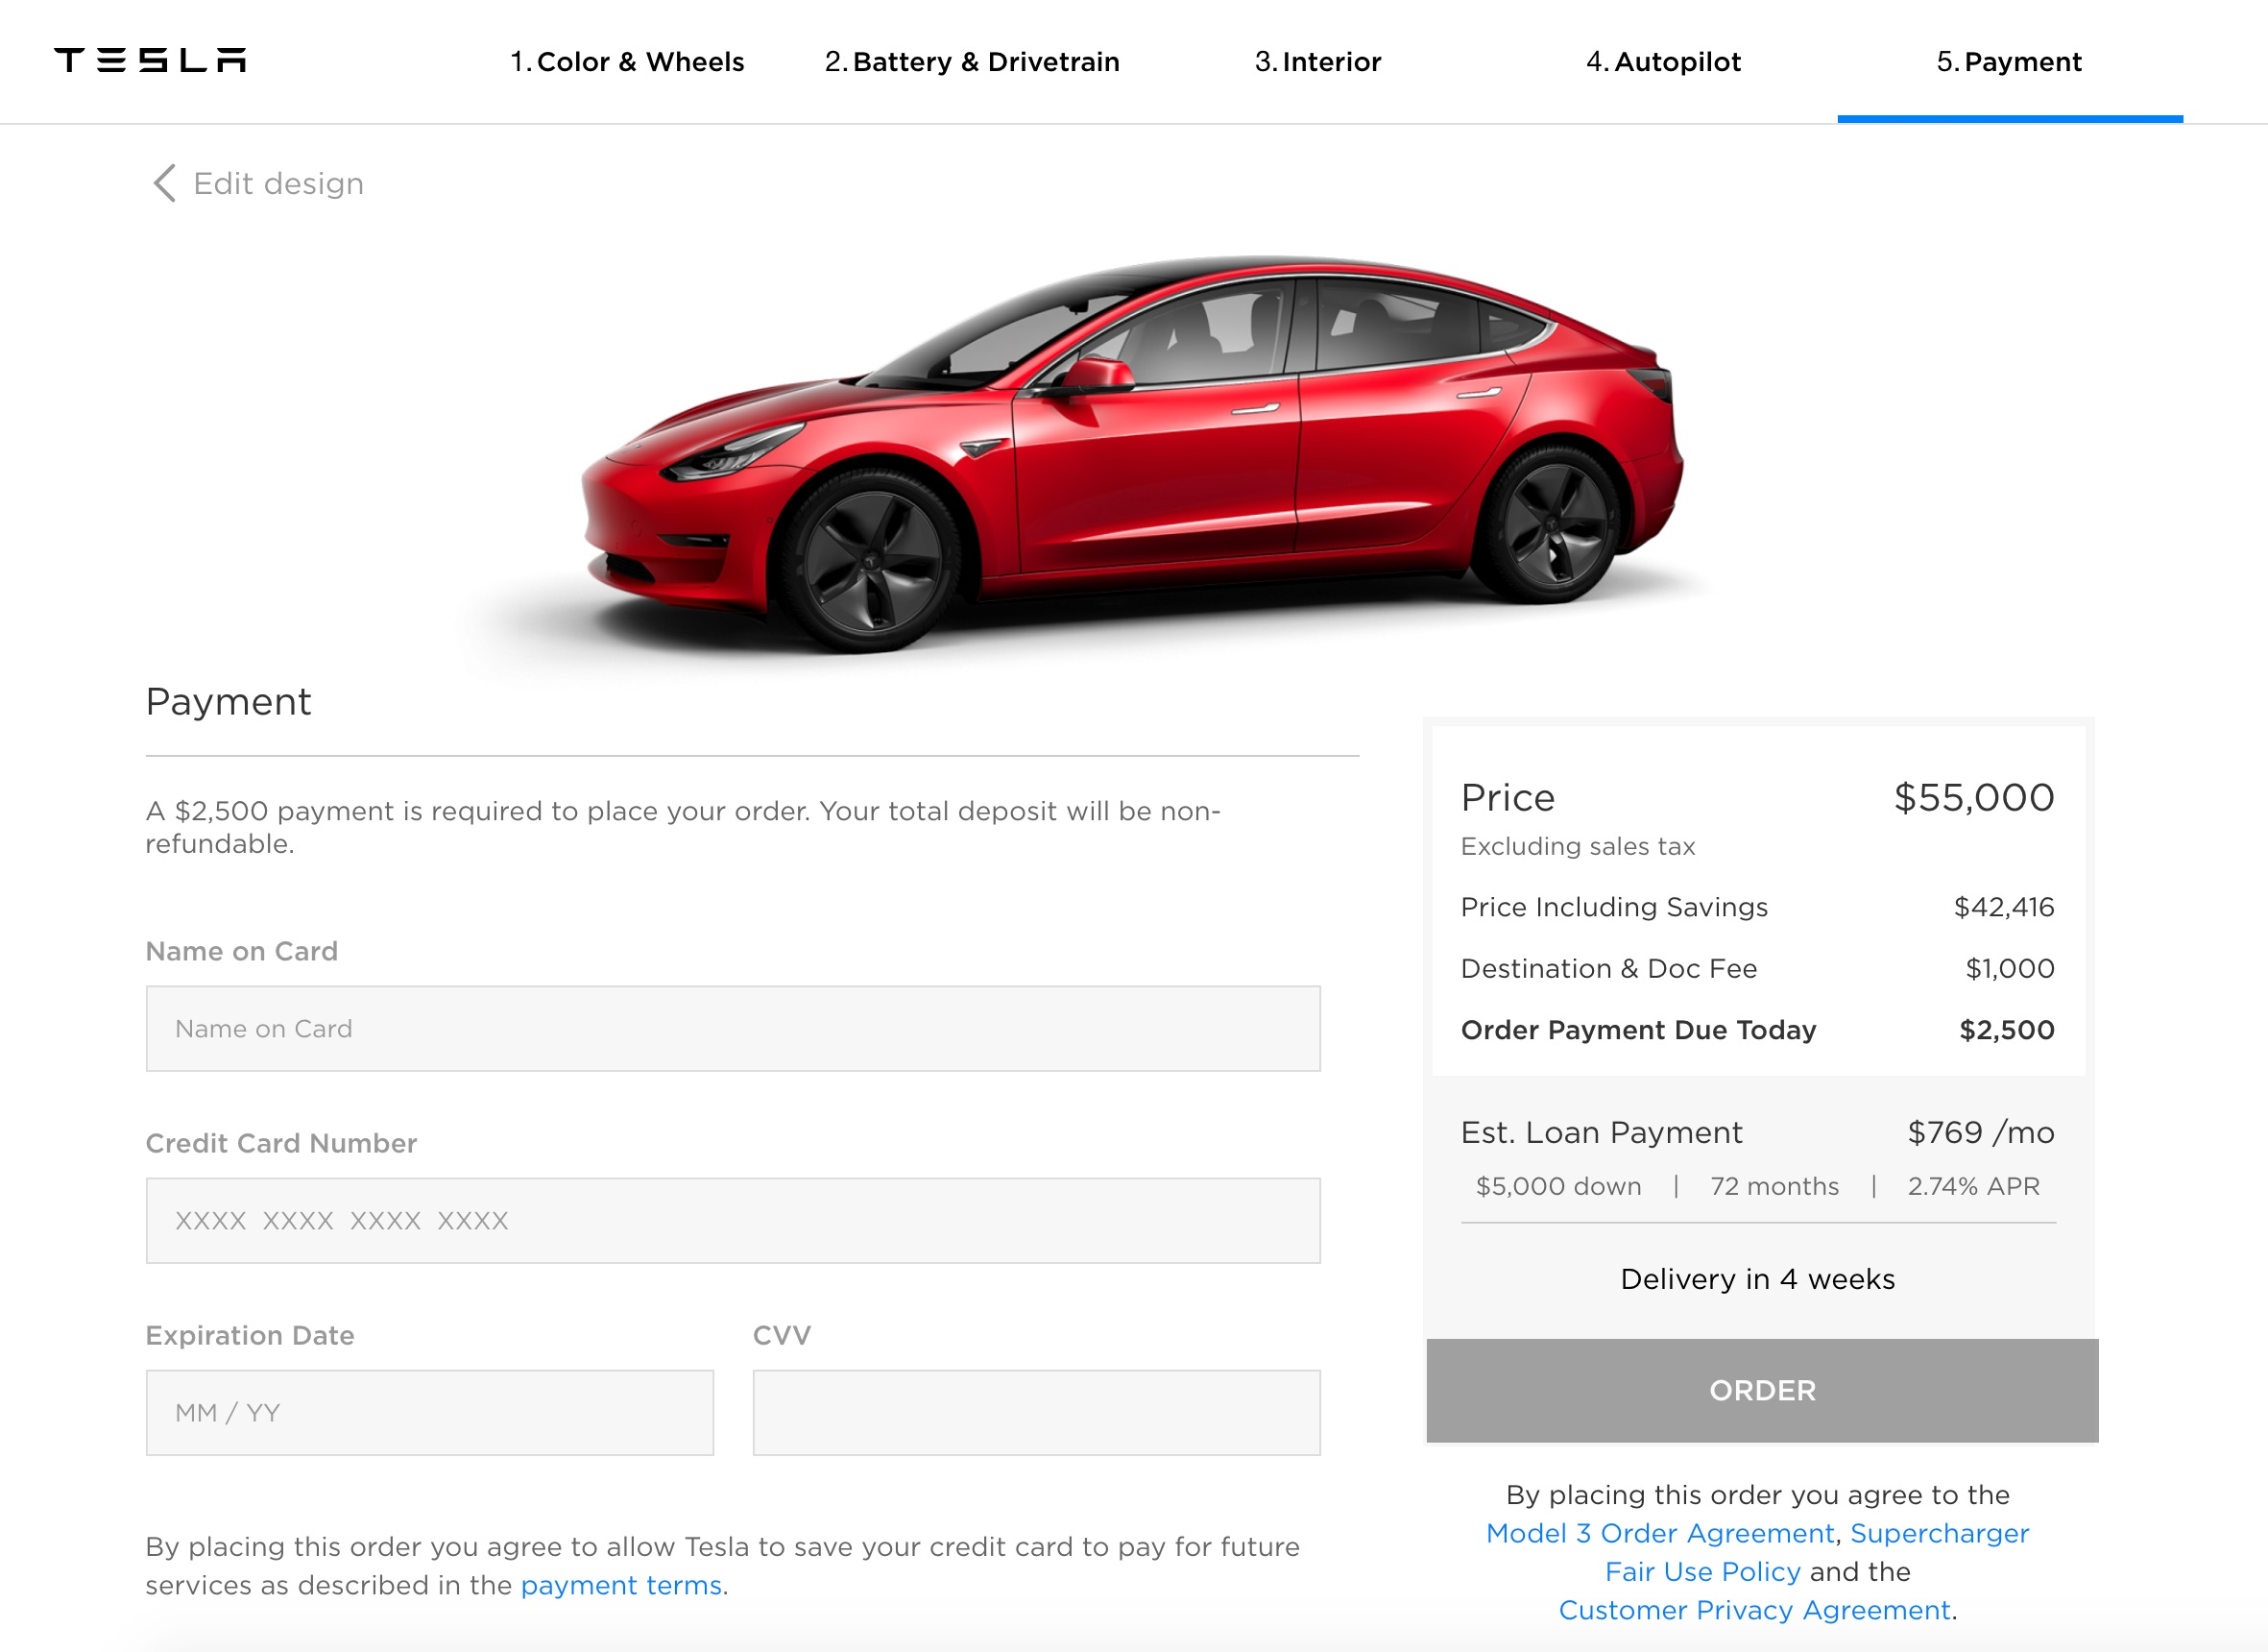 model-3-online-configurator-payment-order-jan-2018